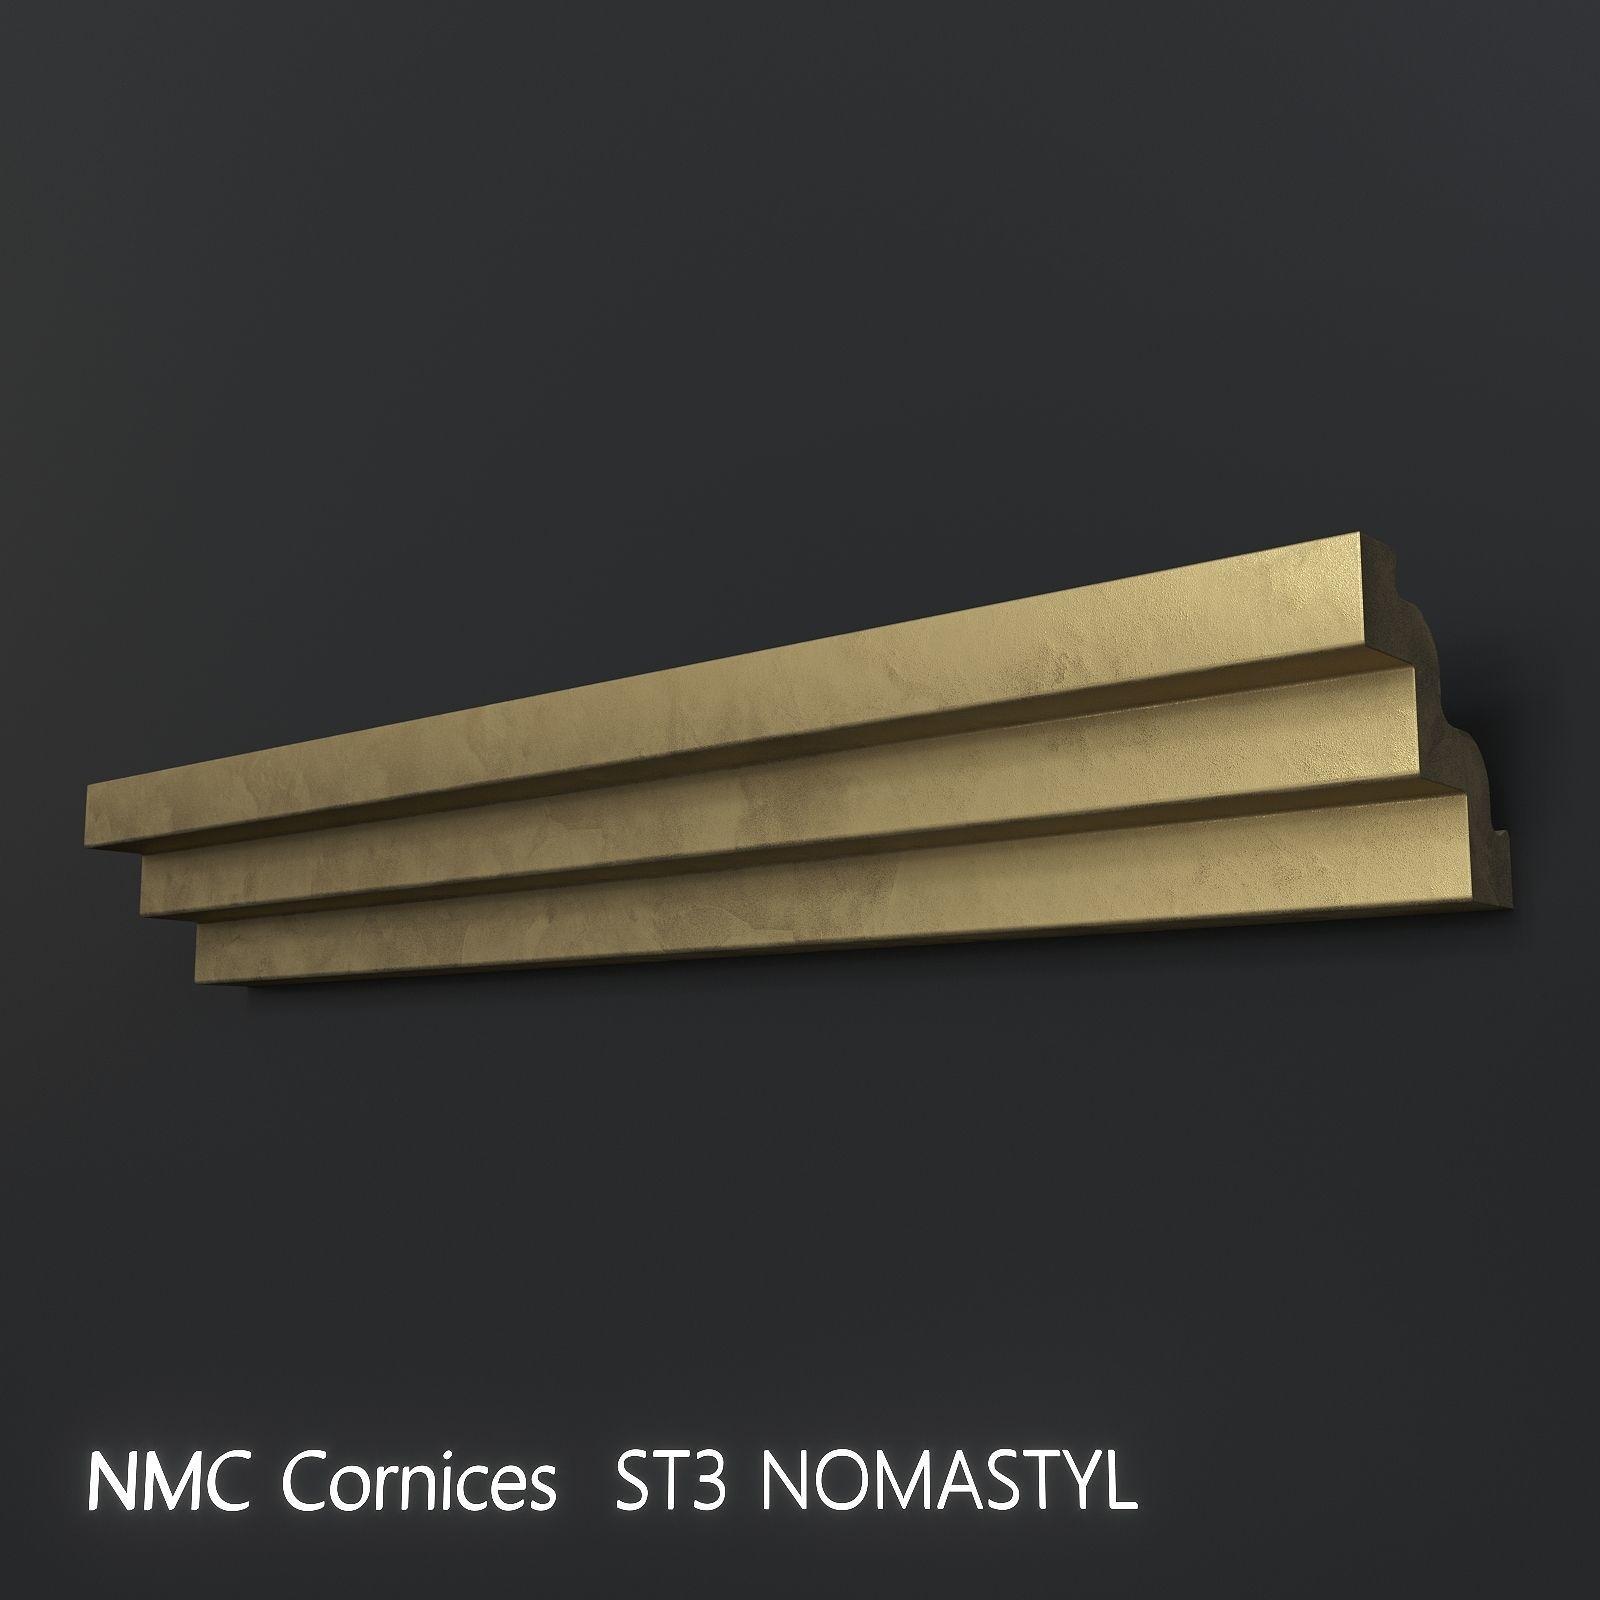 Nmc Cornisa Nomastyl ST3